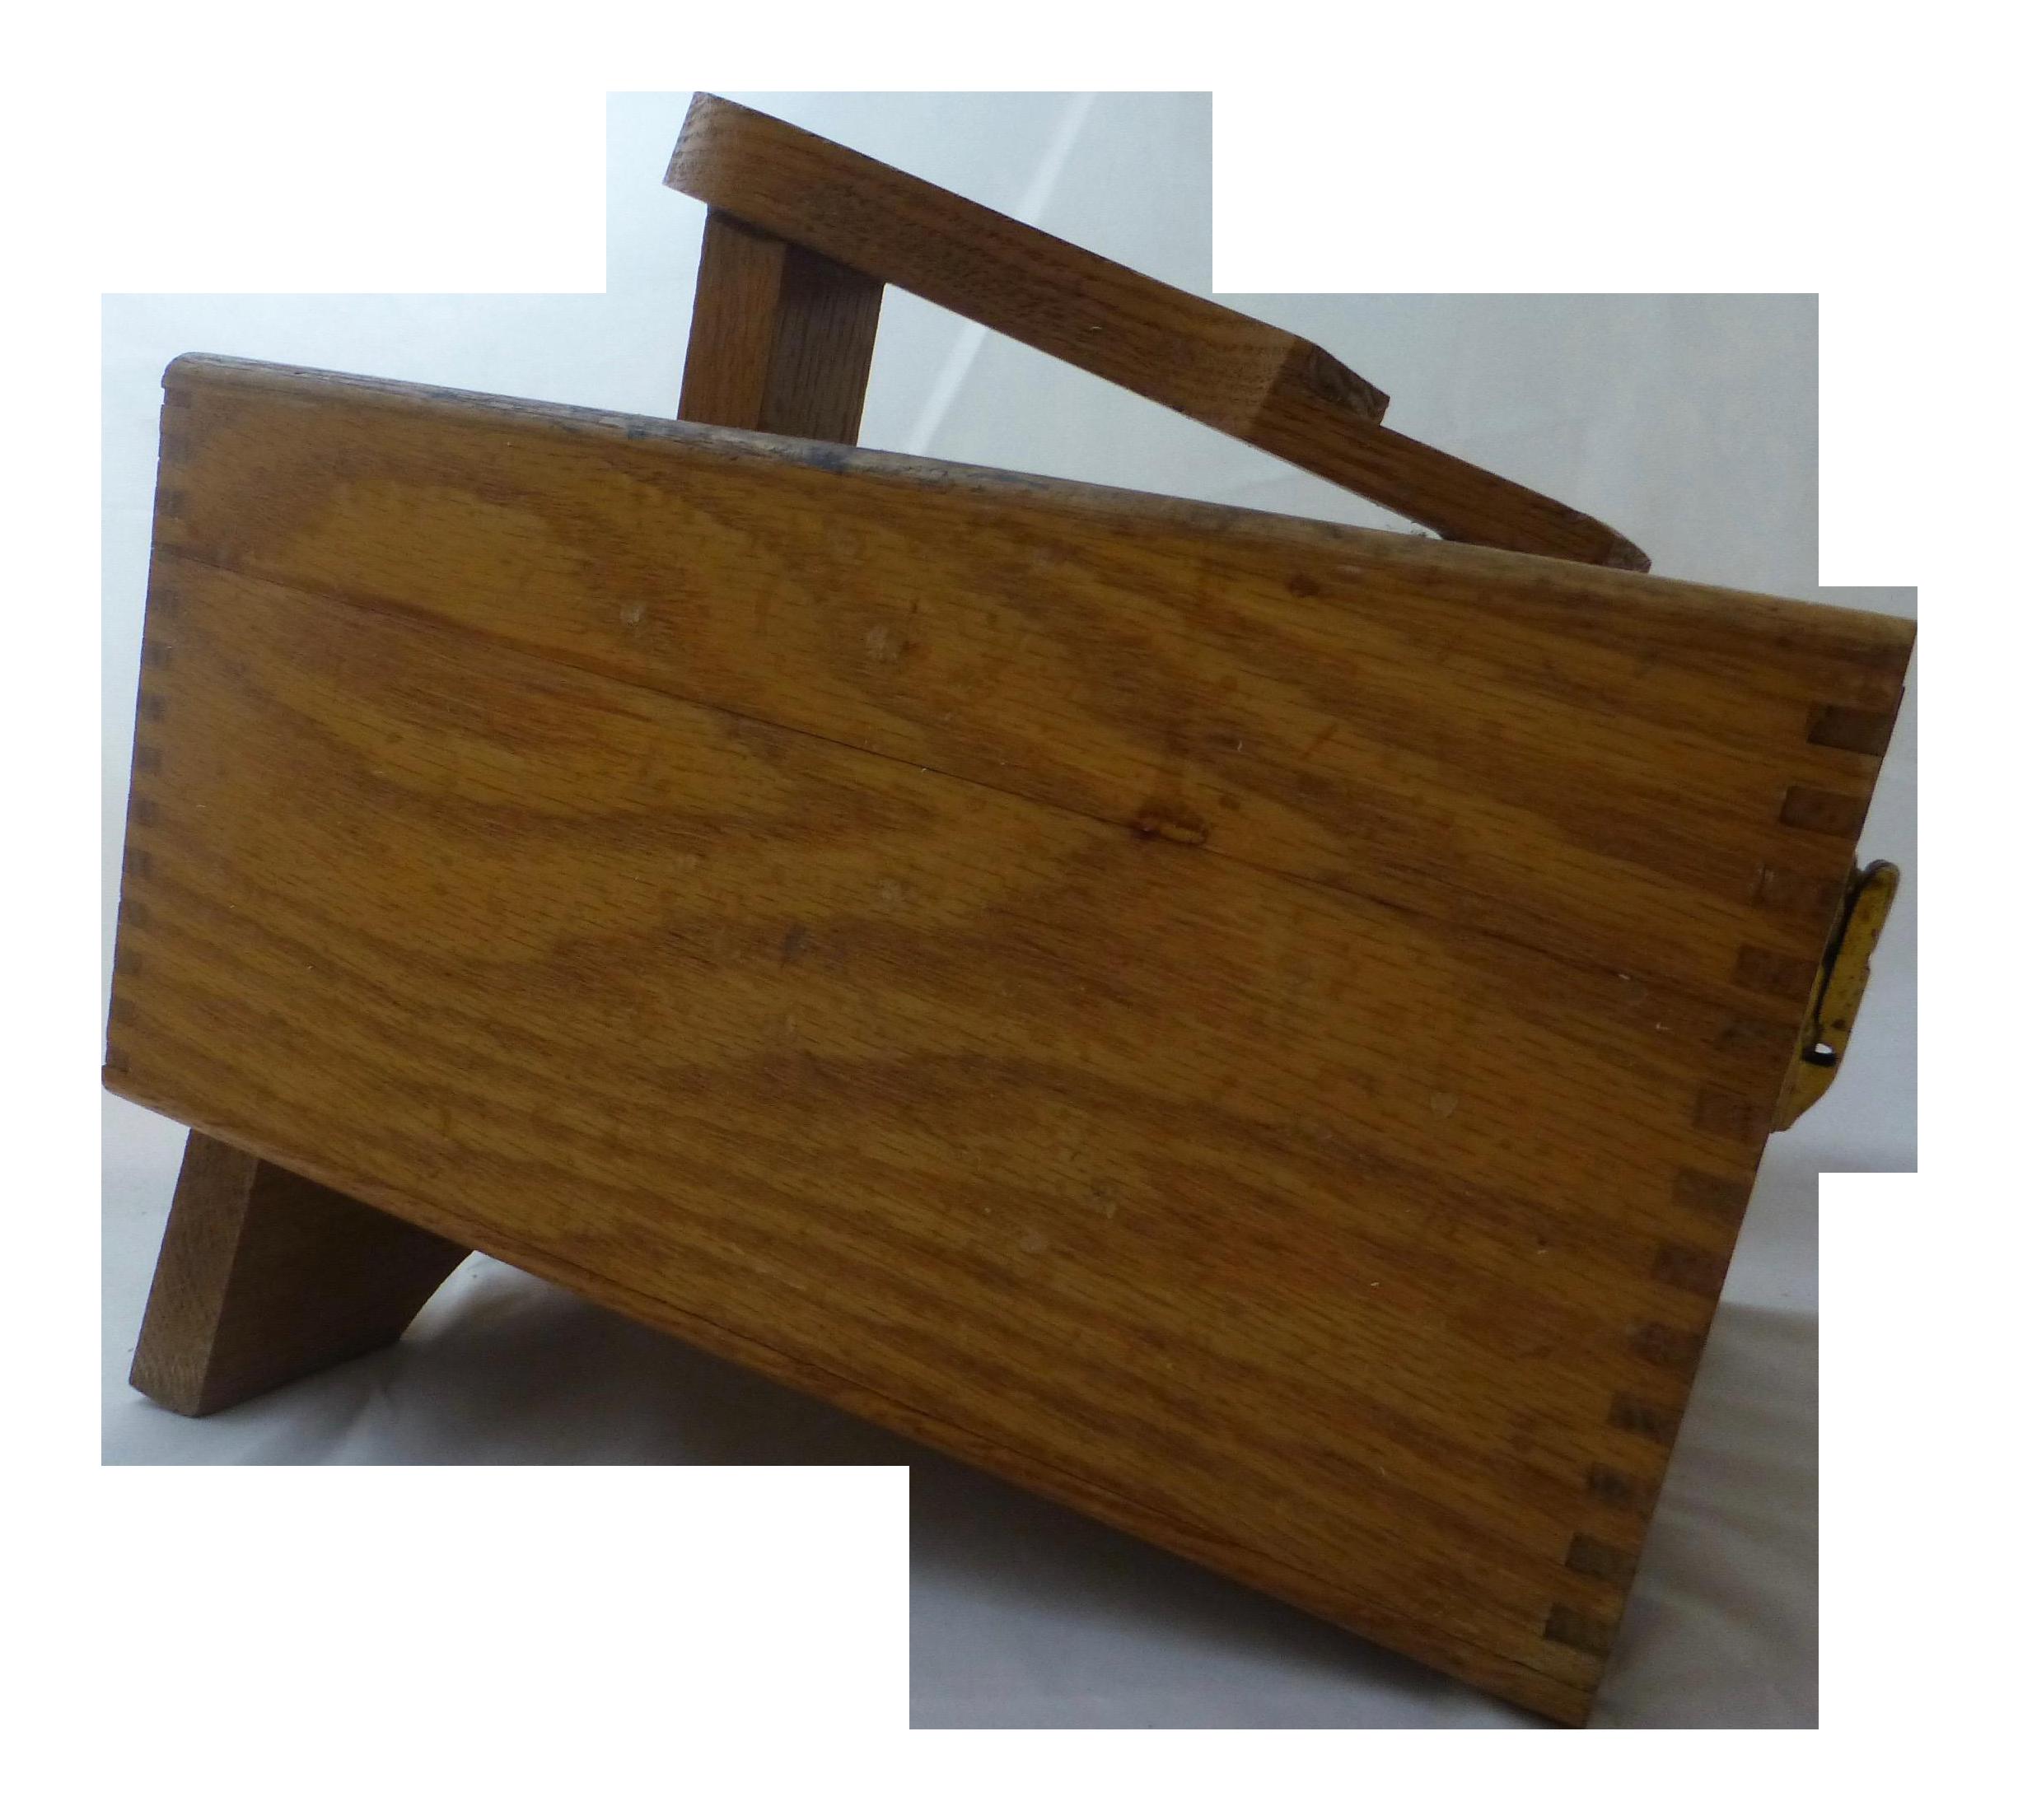 Antique Griffin Shinemaster Shoe Shine Box Chairish